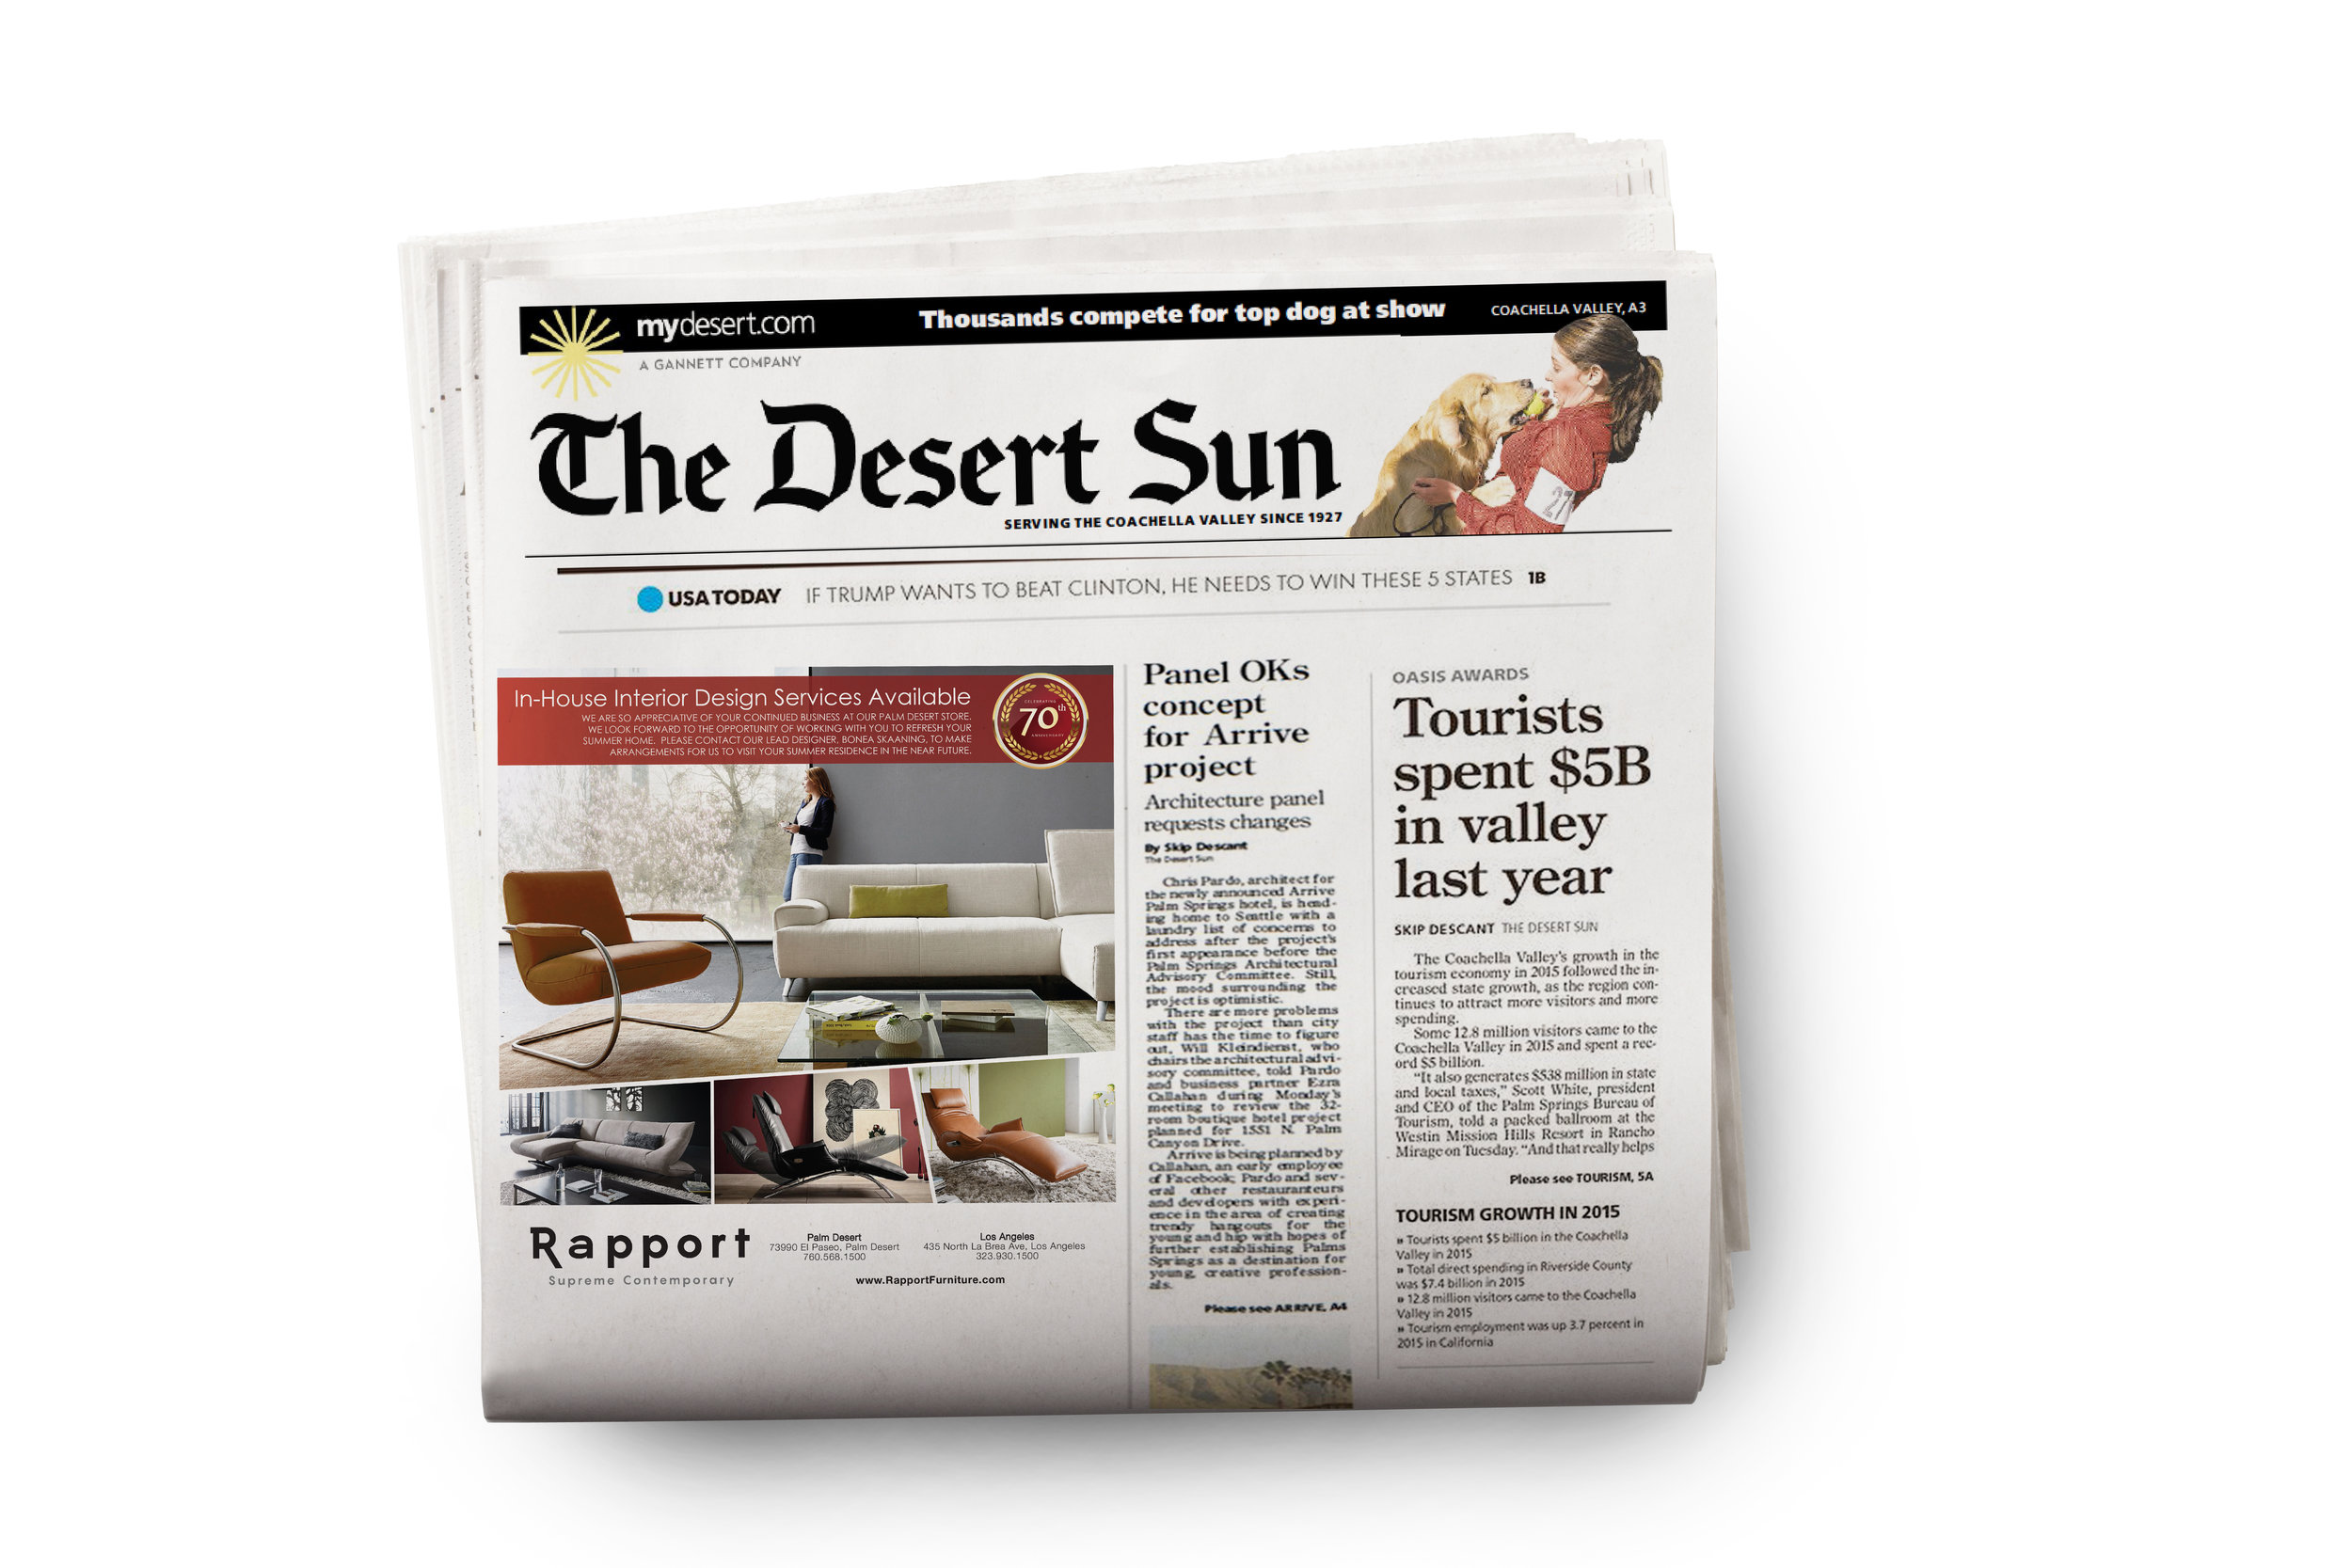 Rapport_DesertSunNewspaper_MOCKUP5.jpg